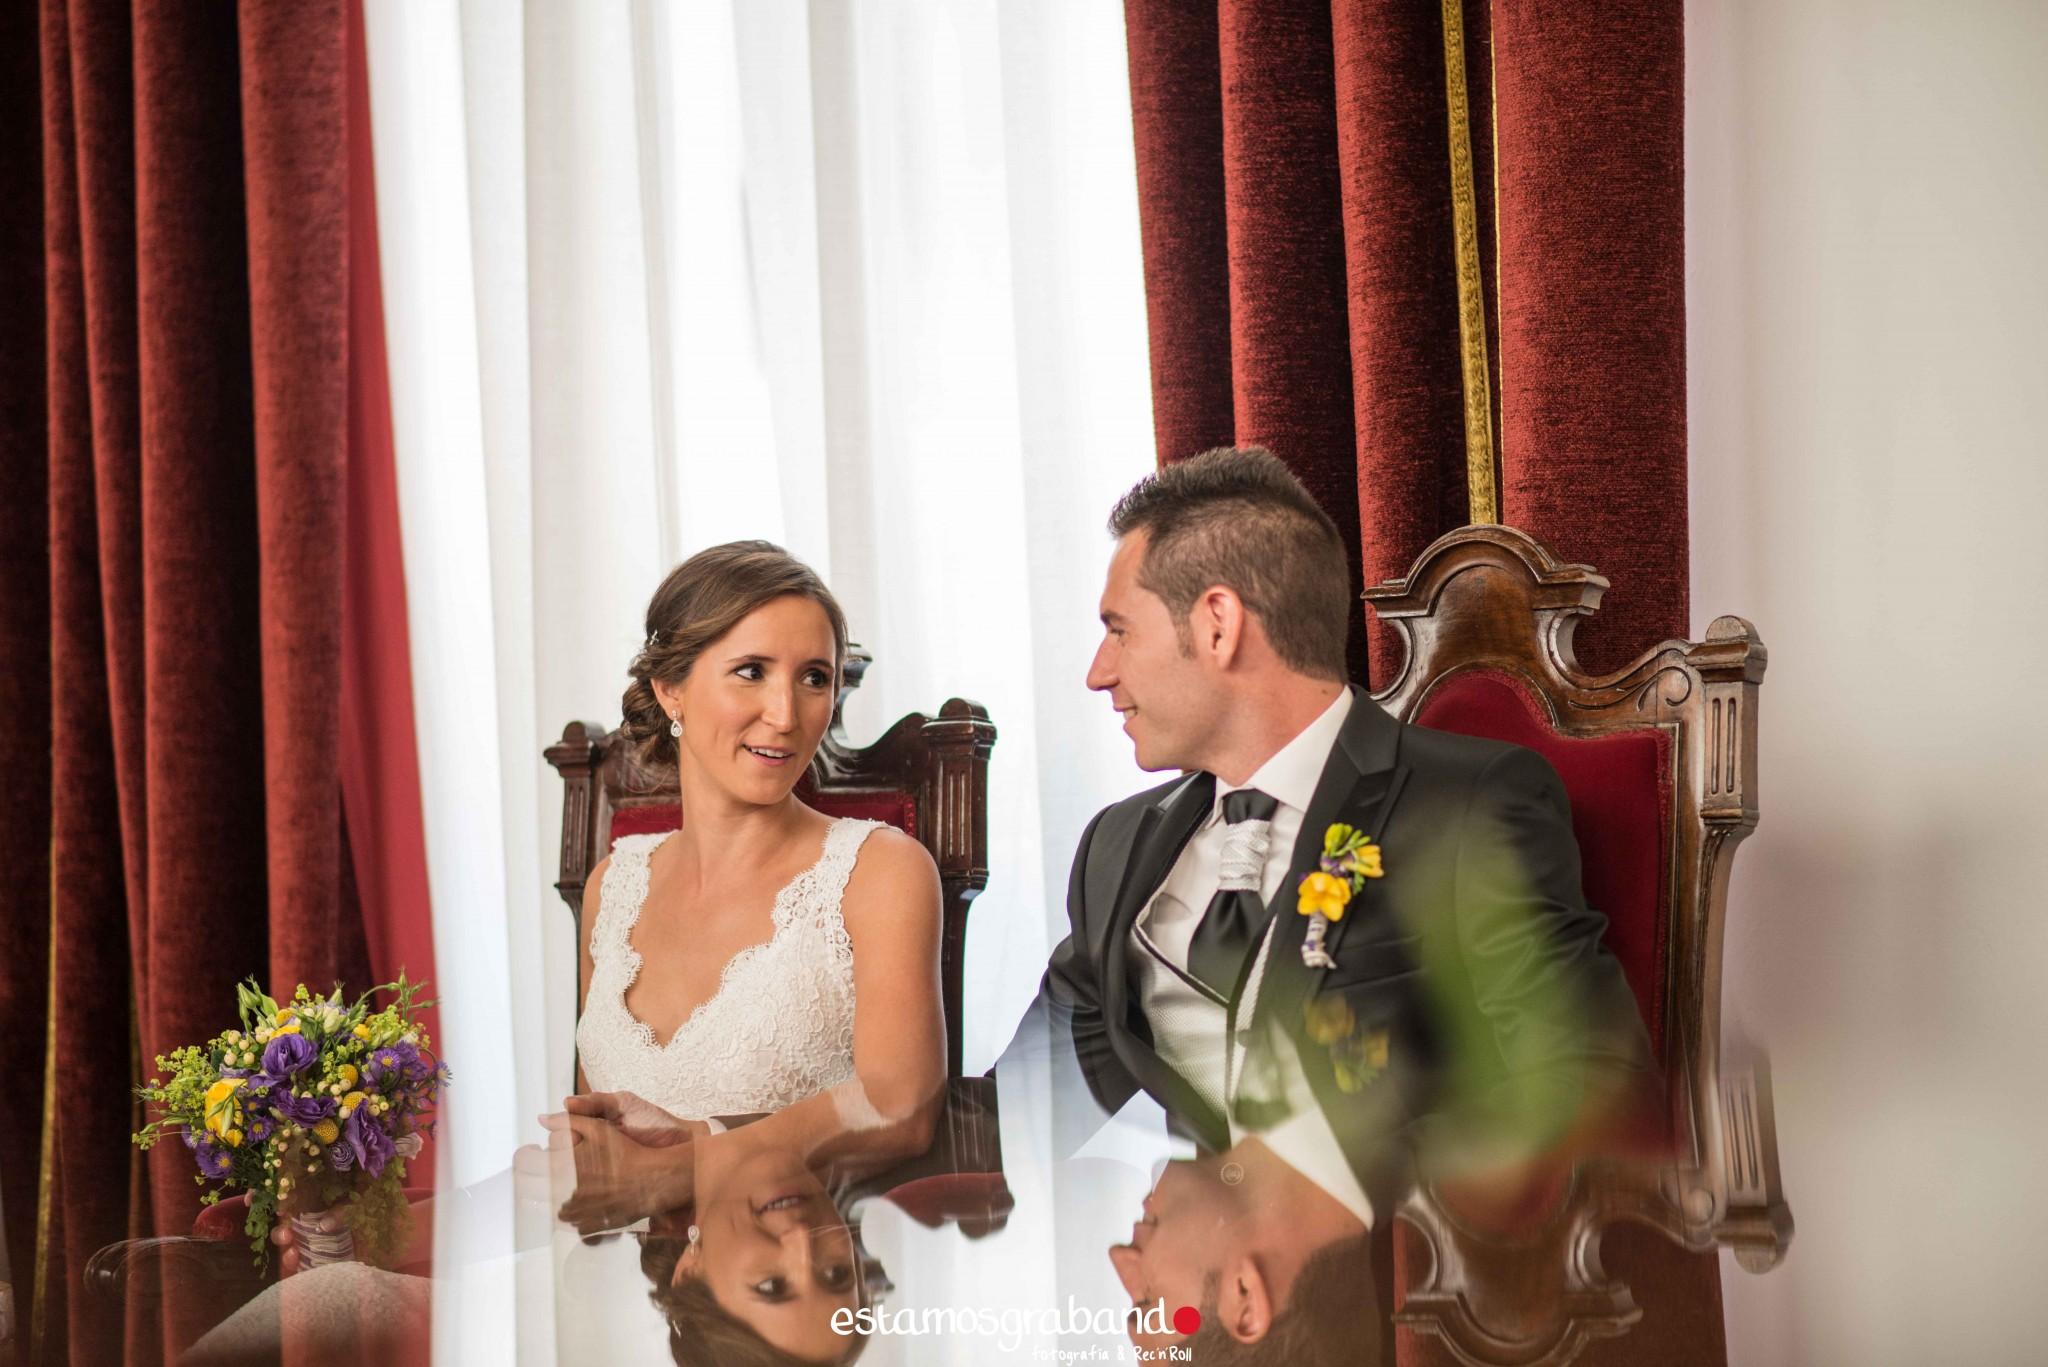 LEO-Y-PEDRO-26 Fotografía de Boda_Leo & Pedro [Jardines de la Mamunia, Granada] - video boda cadiz